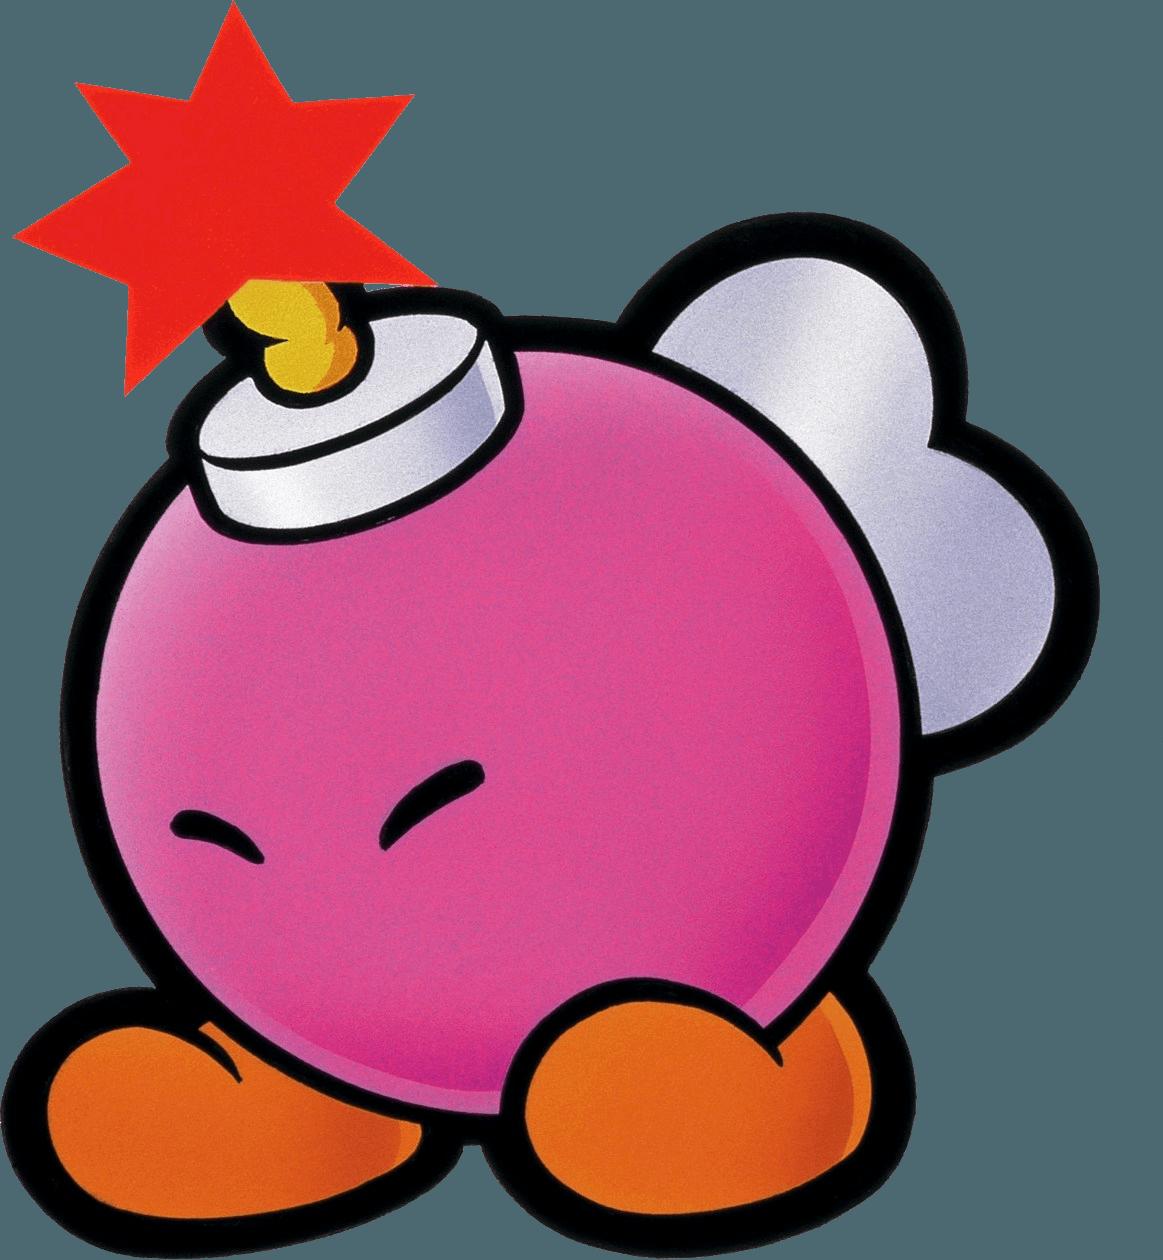 Paper Mario (Nintendo 64) Artwork Including Characters